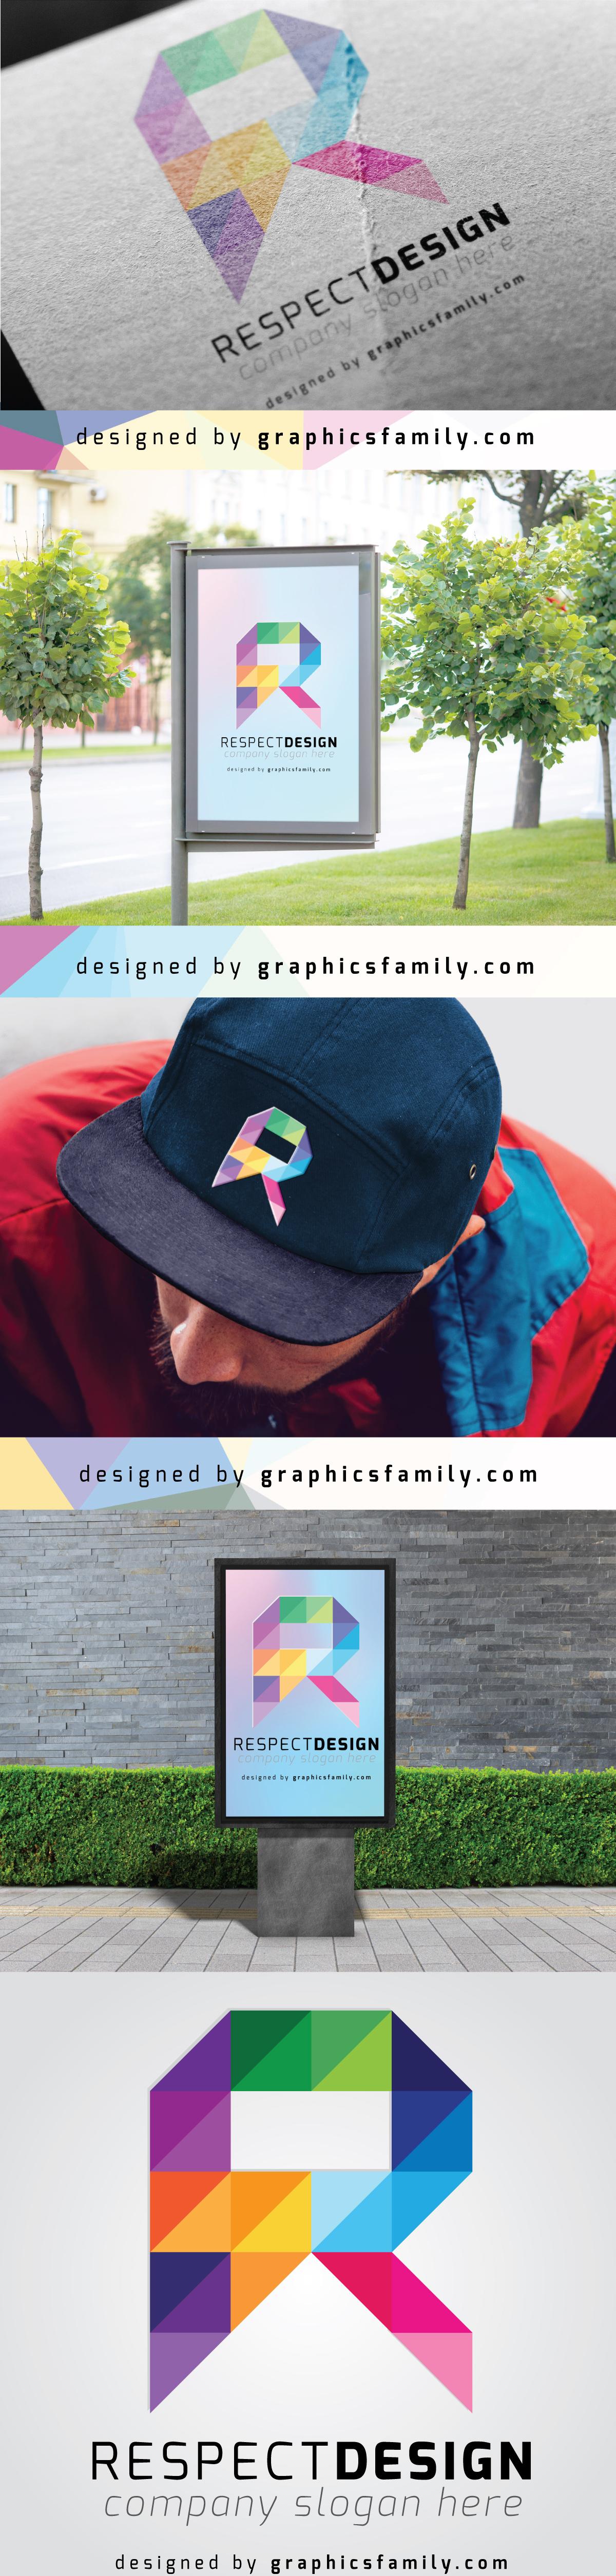 R-Letter-Logo-Design-Idea-MockUp